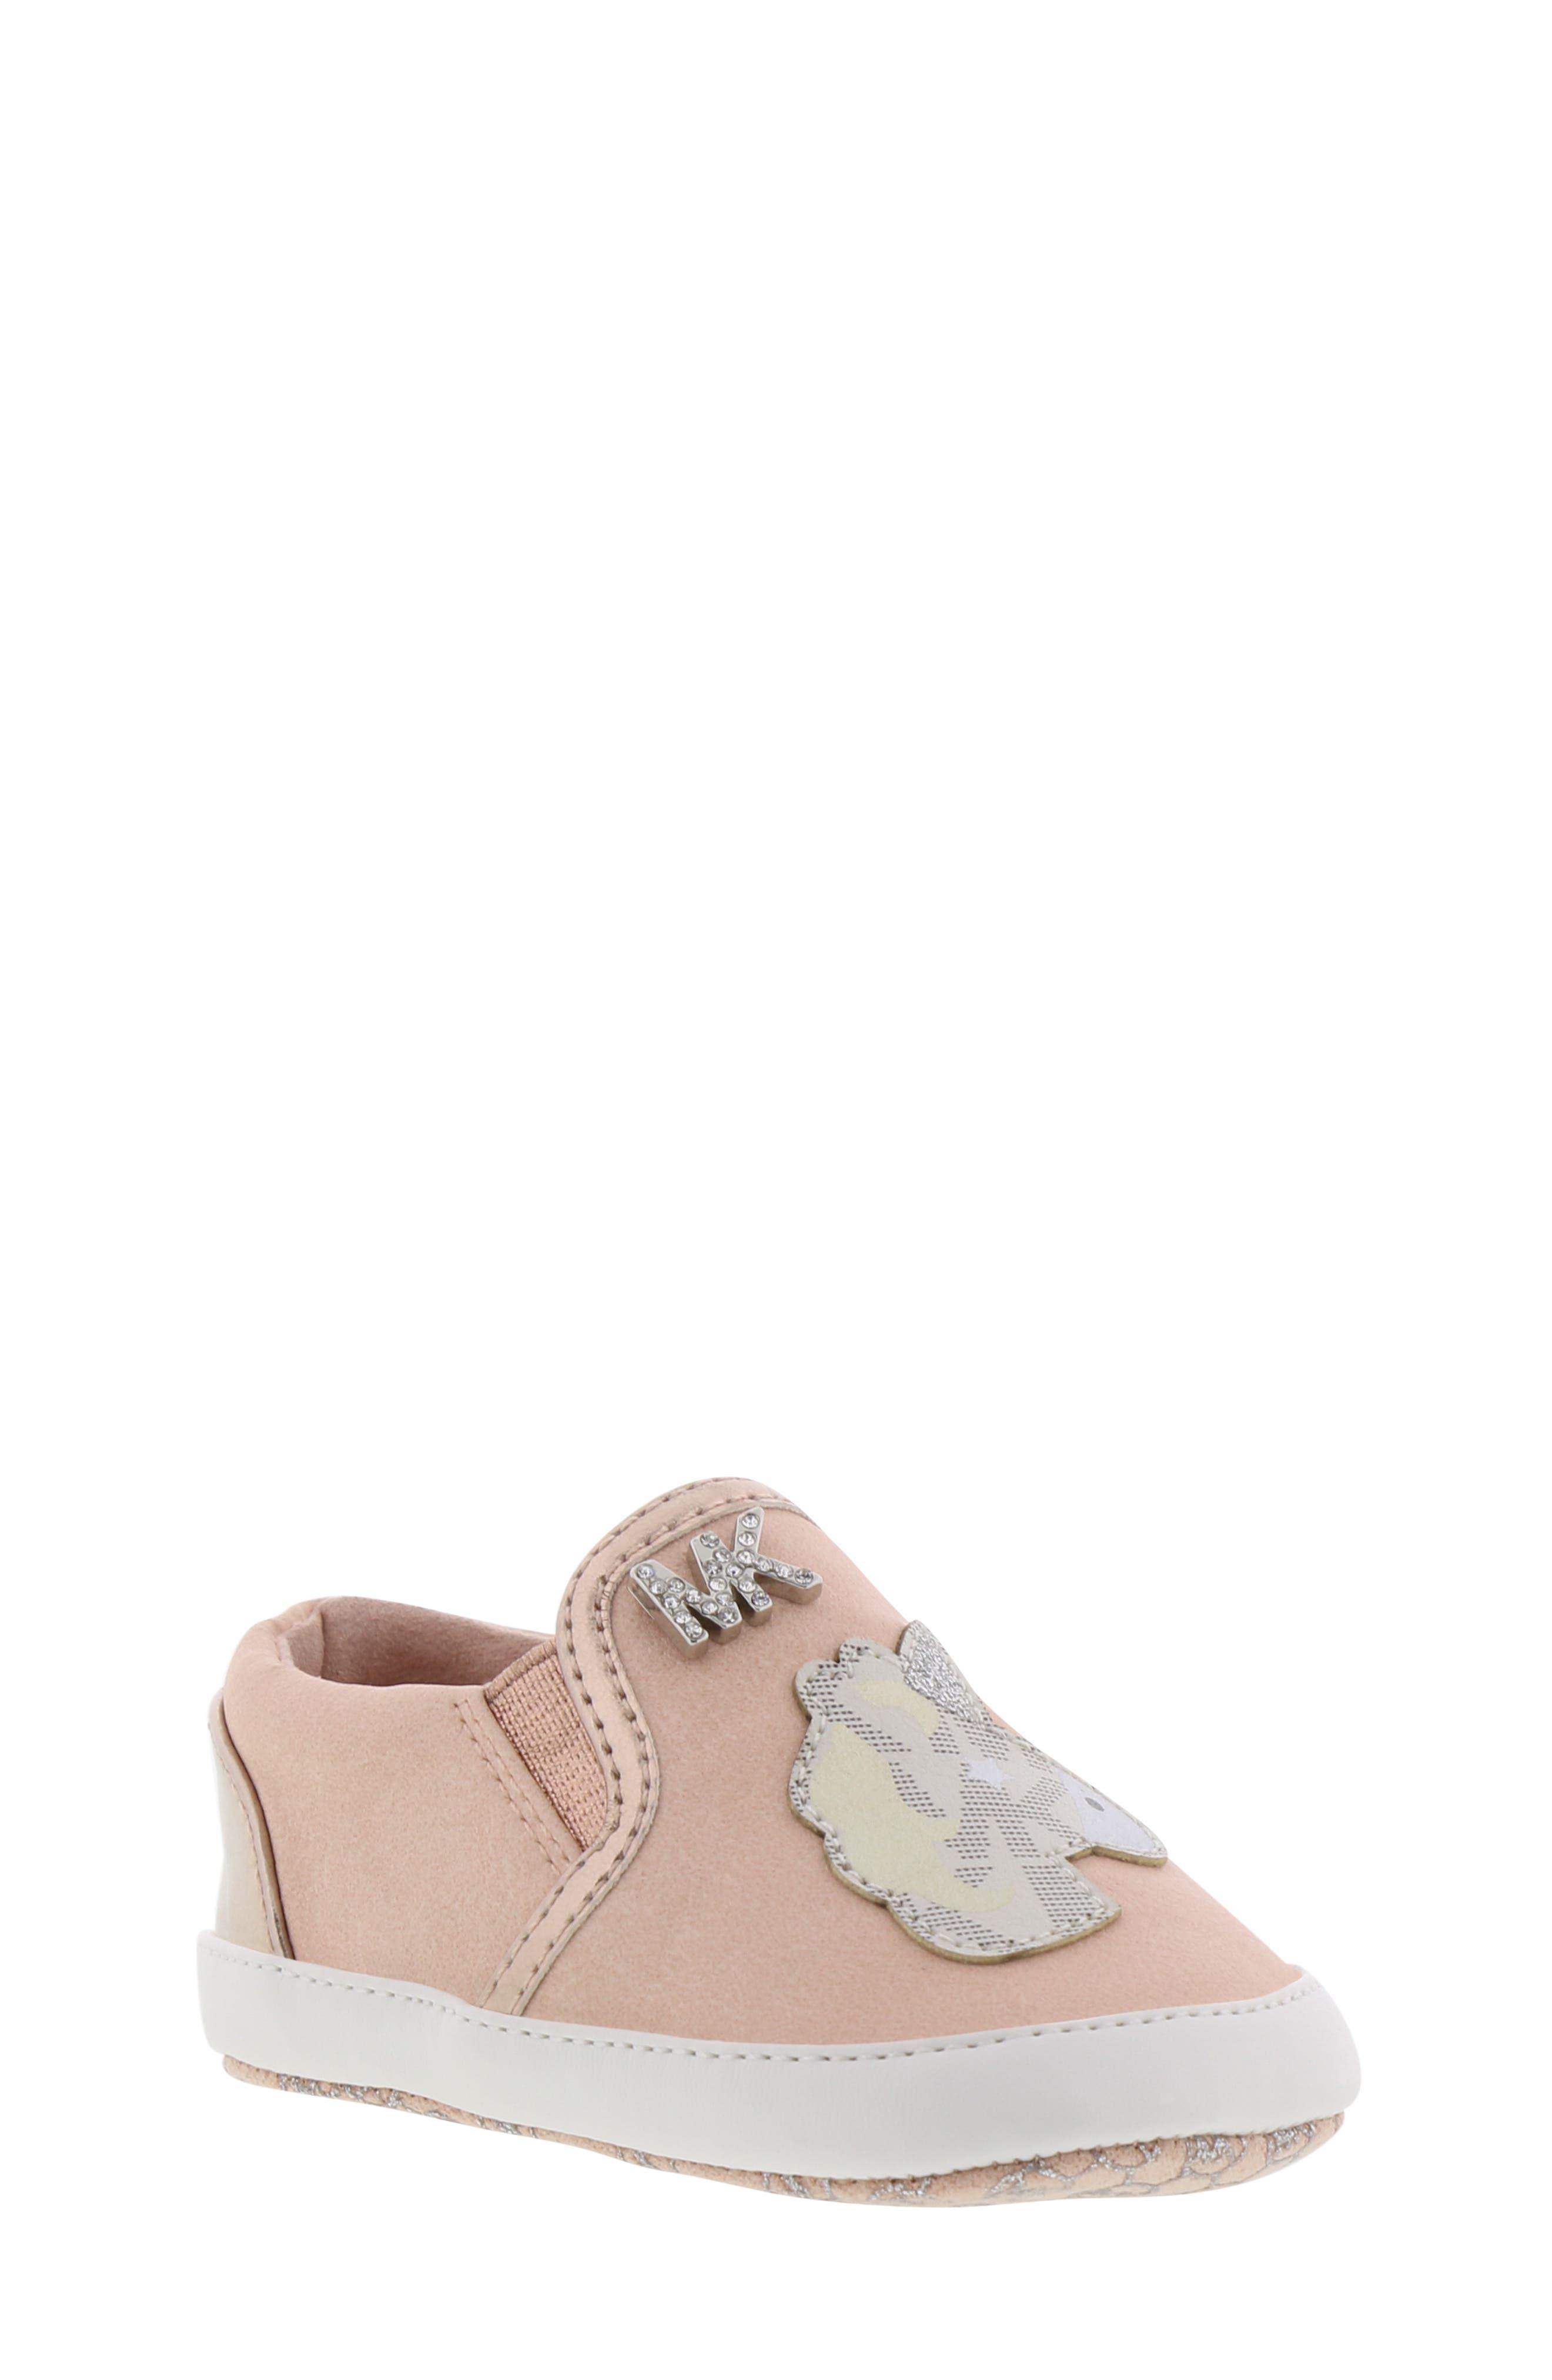 MICHAEL MICHAEL KORS Magic Slip-On Sneaker, Main, color, BLUSH